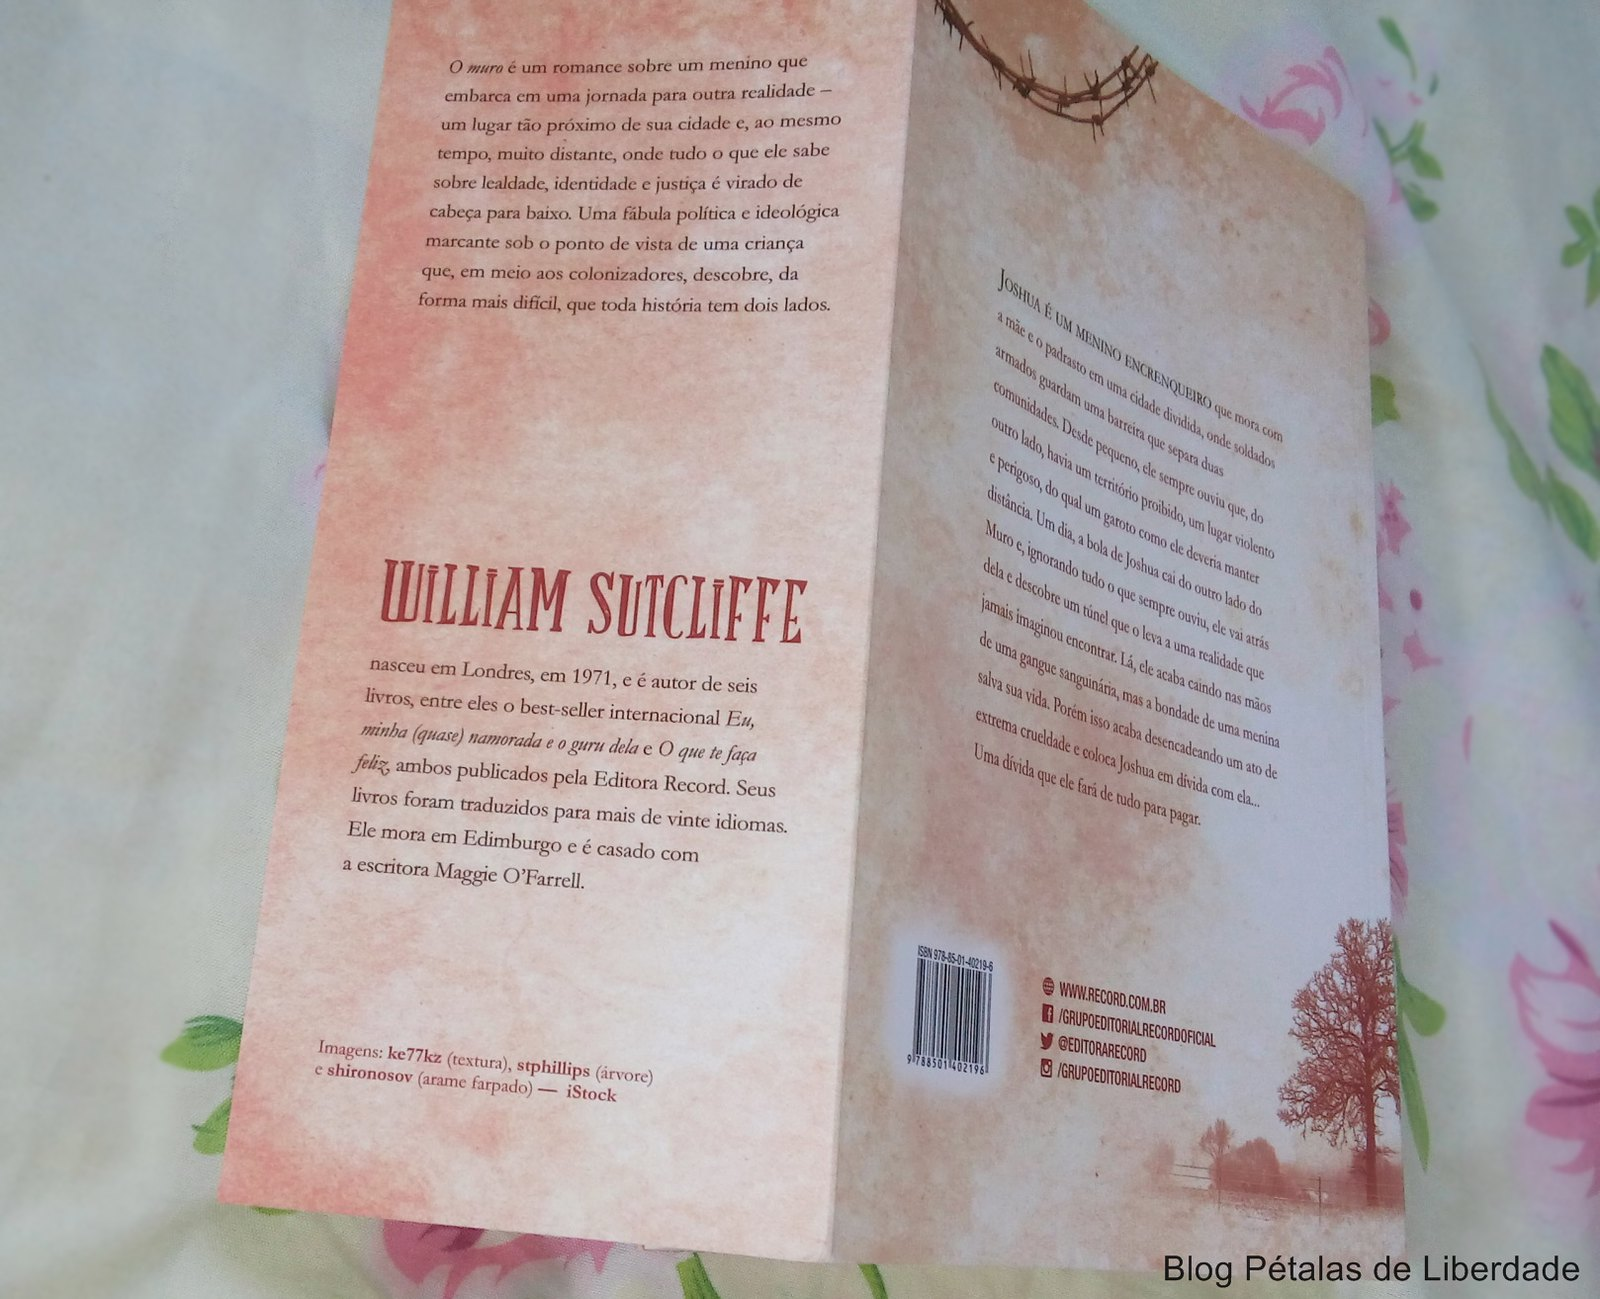 Resenha, livro, O-Muro, William-Sutcliffe, Editora-Record, fotos, capa,